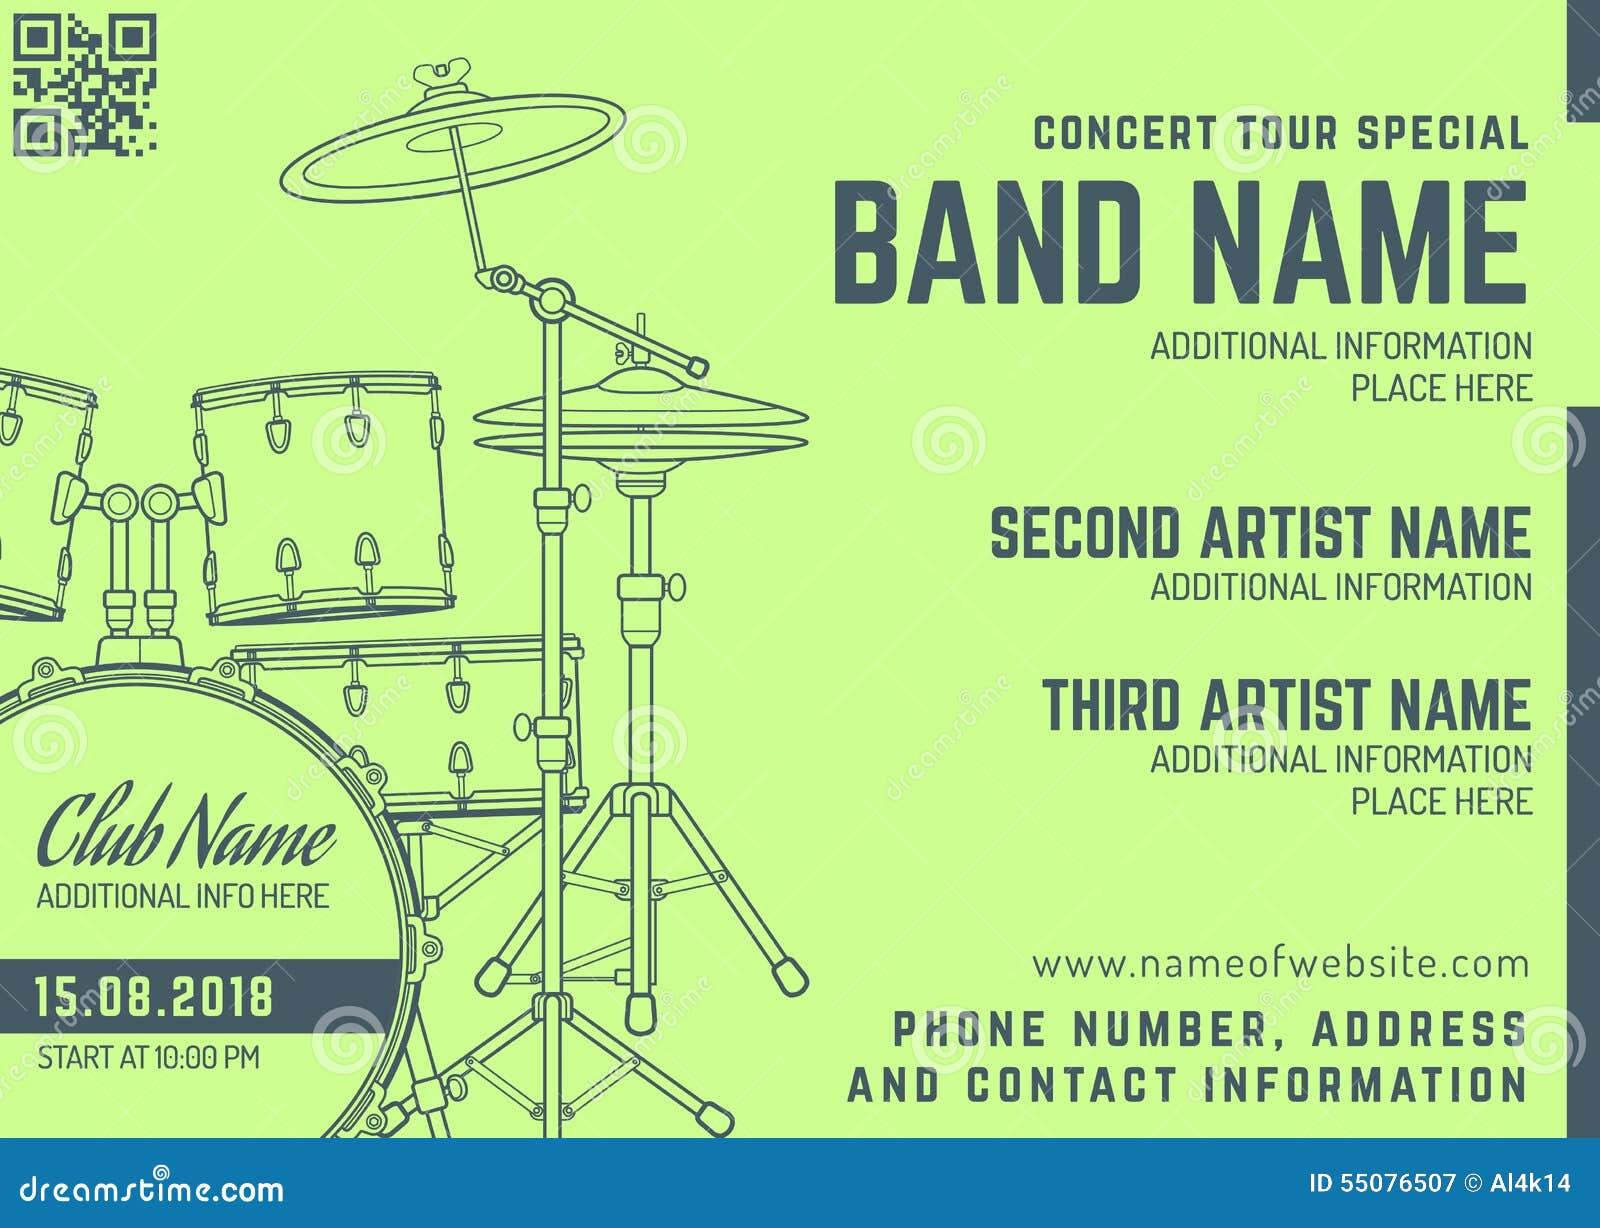 concert program template free